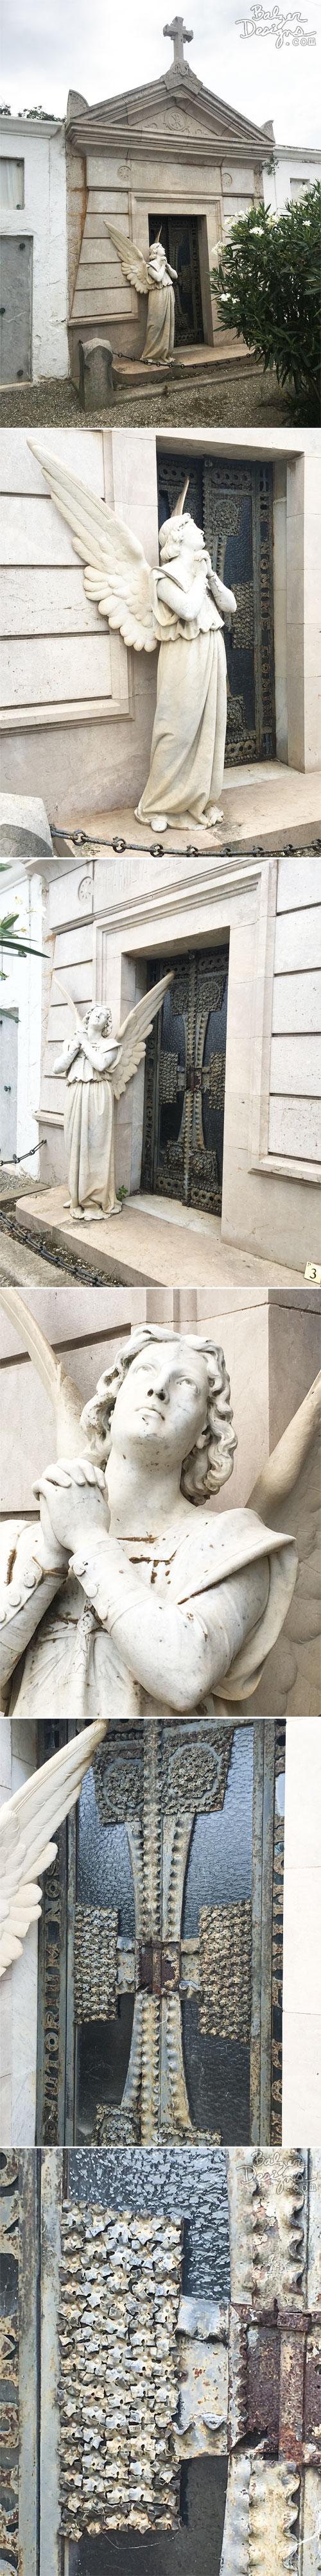 Cemetery5-wm